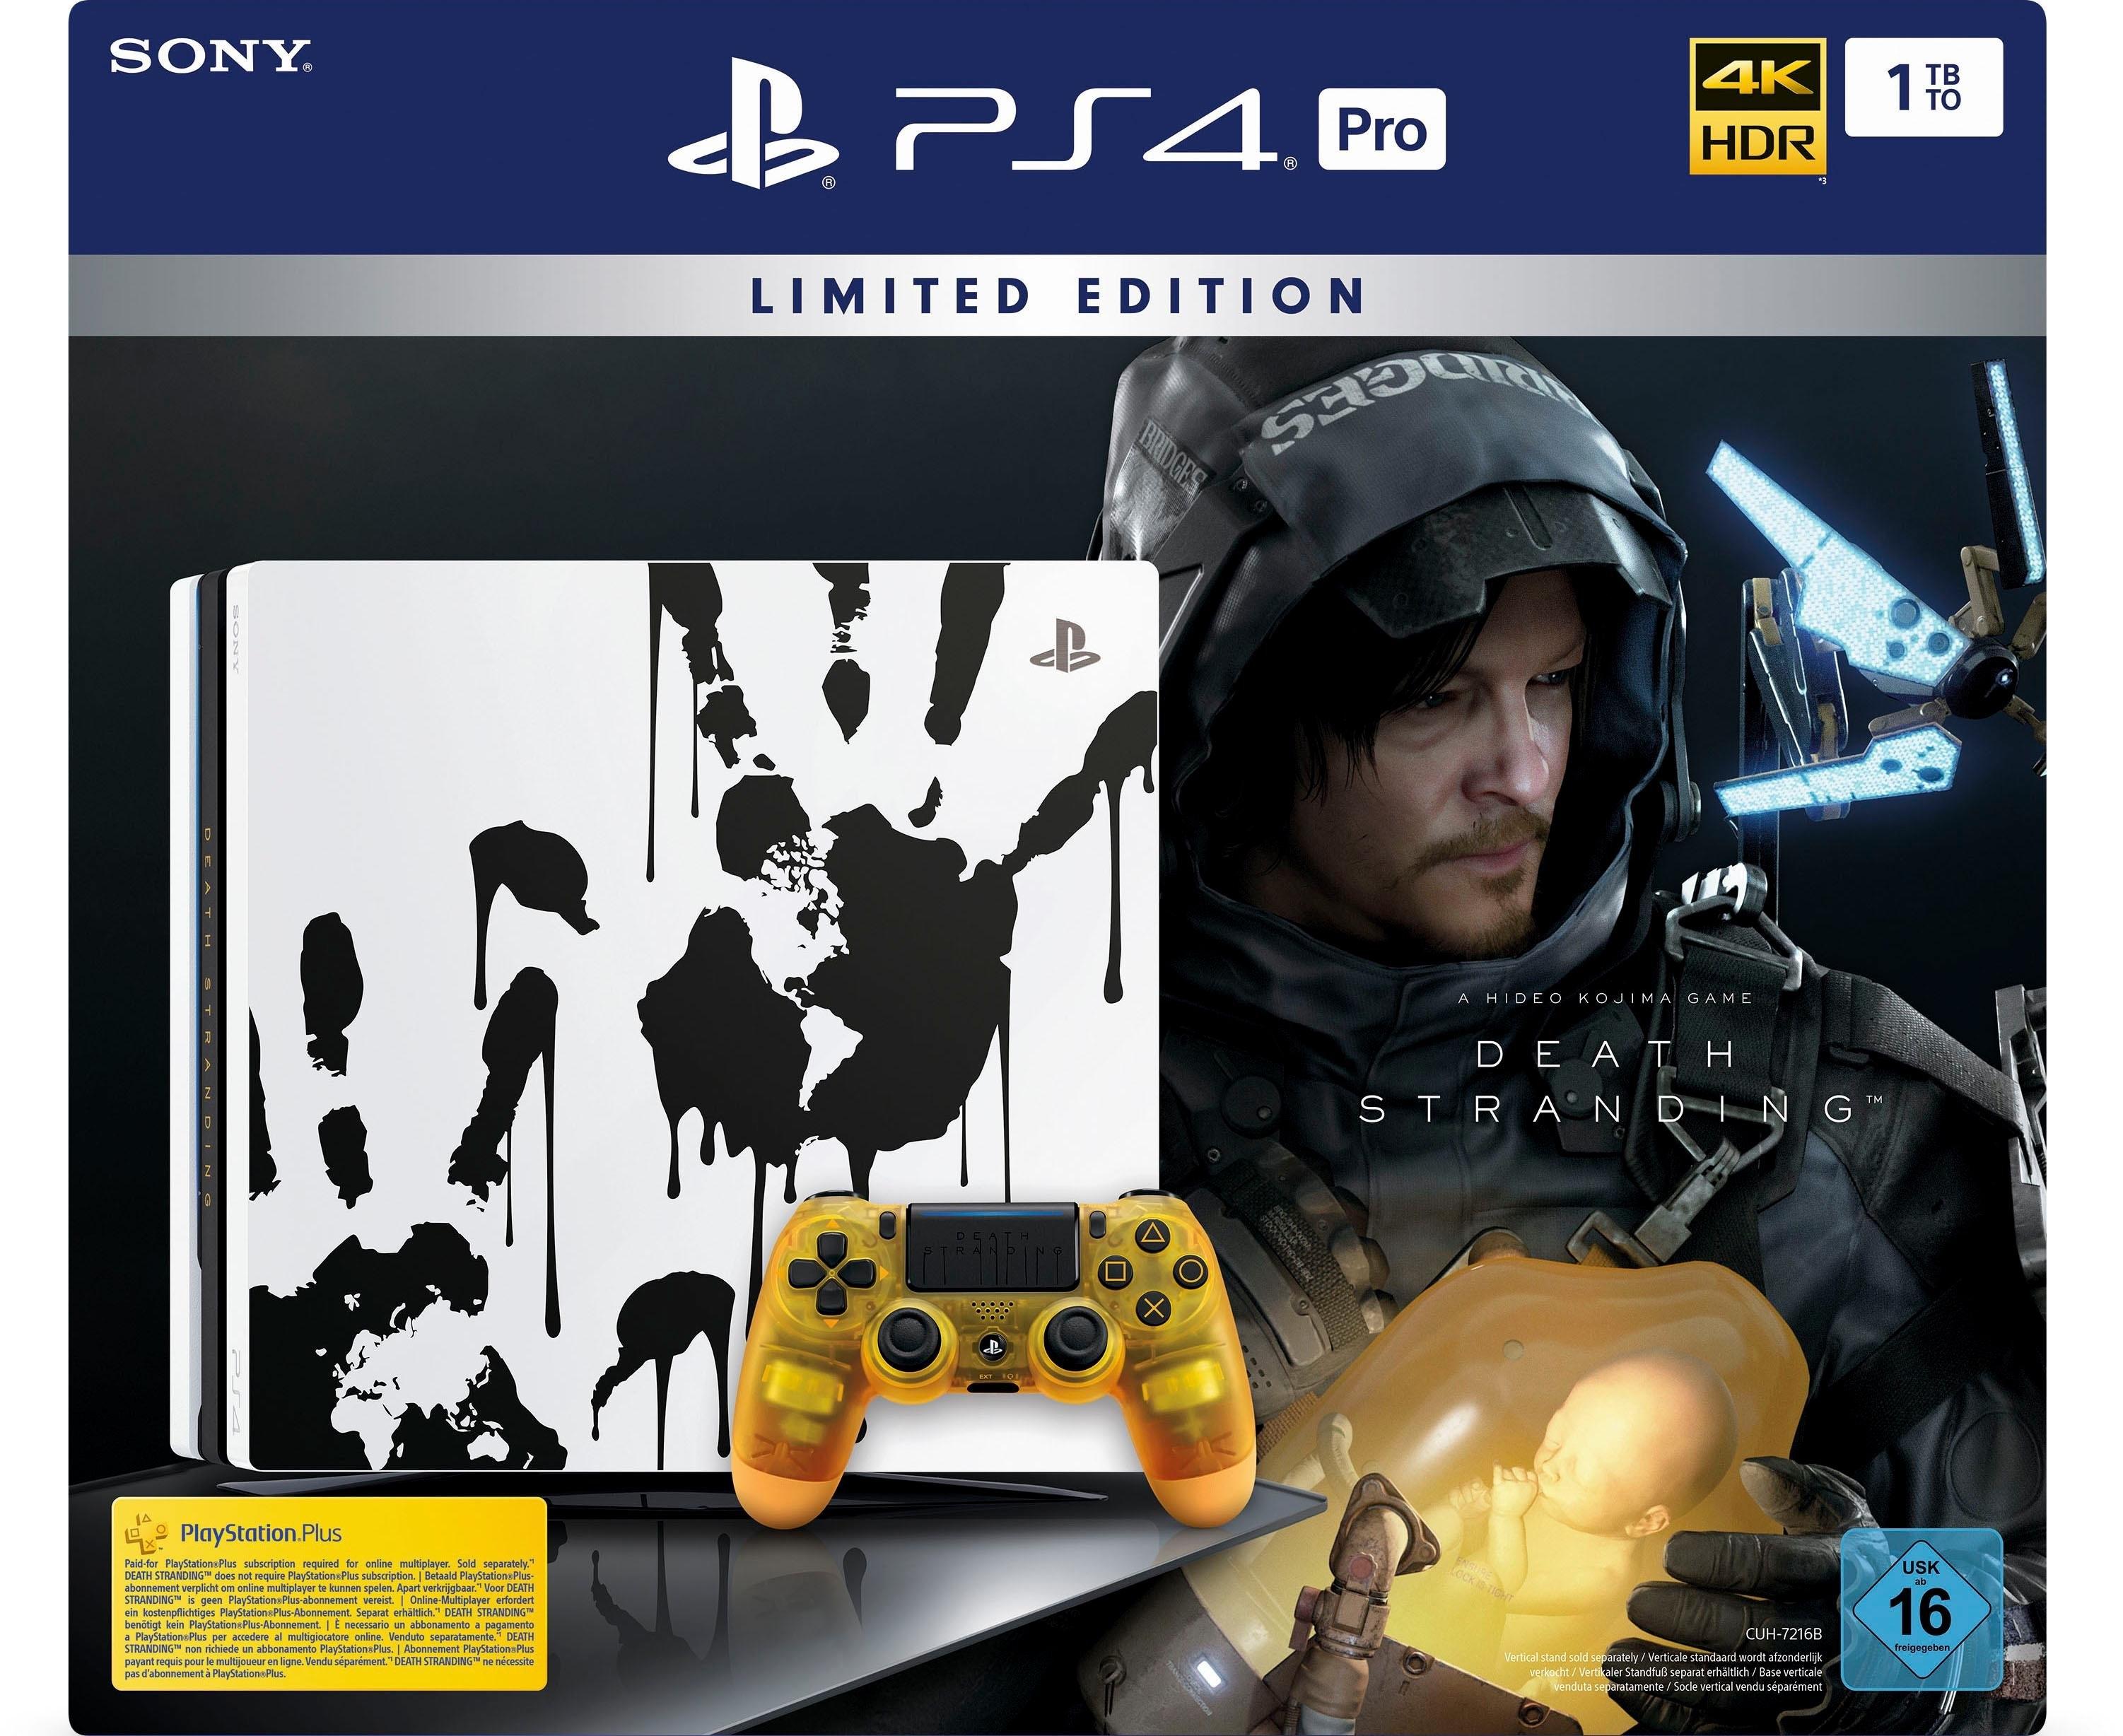 PlayStation 4 »Pro« Console bij OTTO online kopen